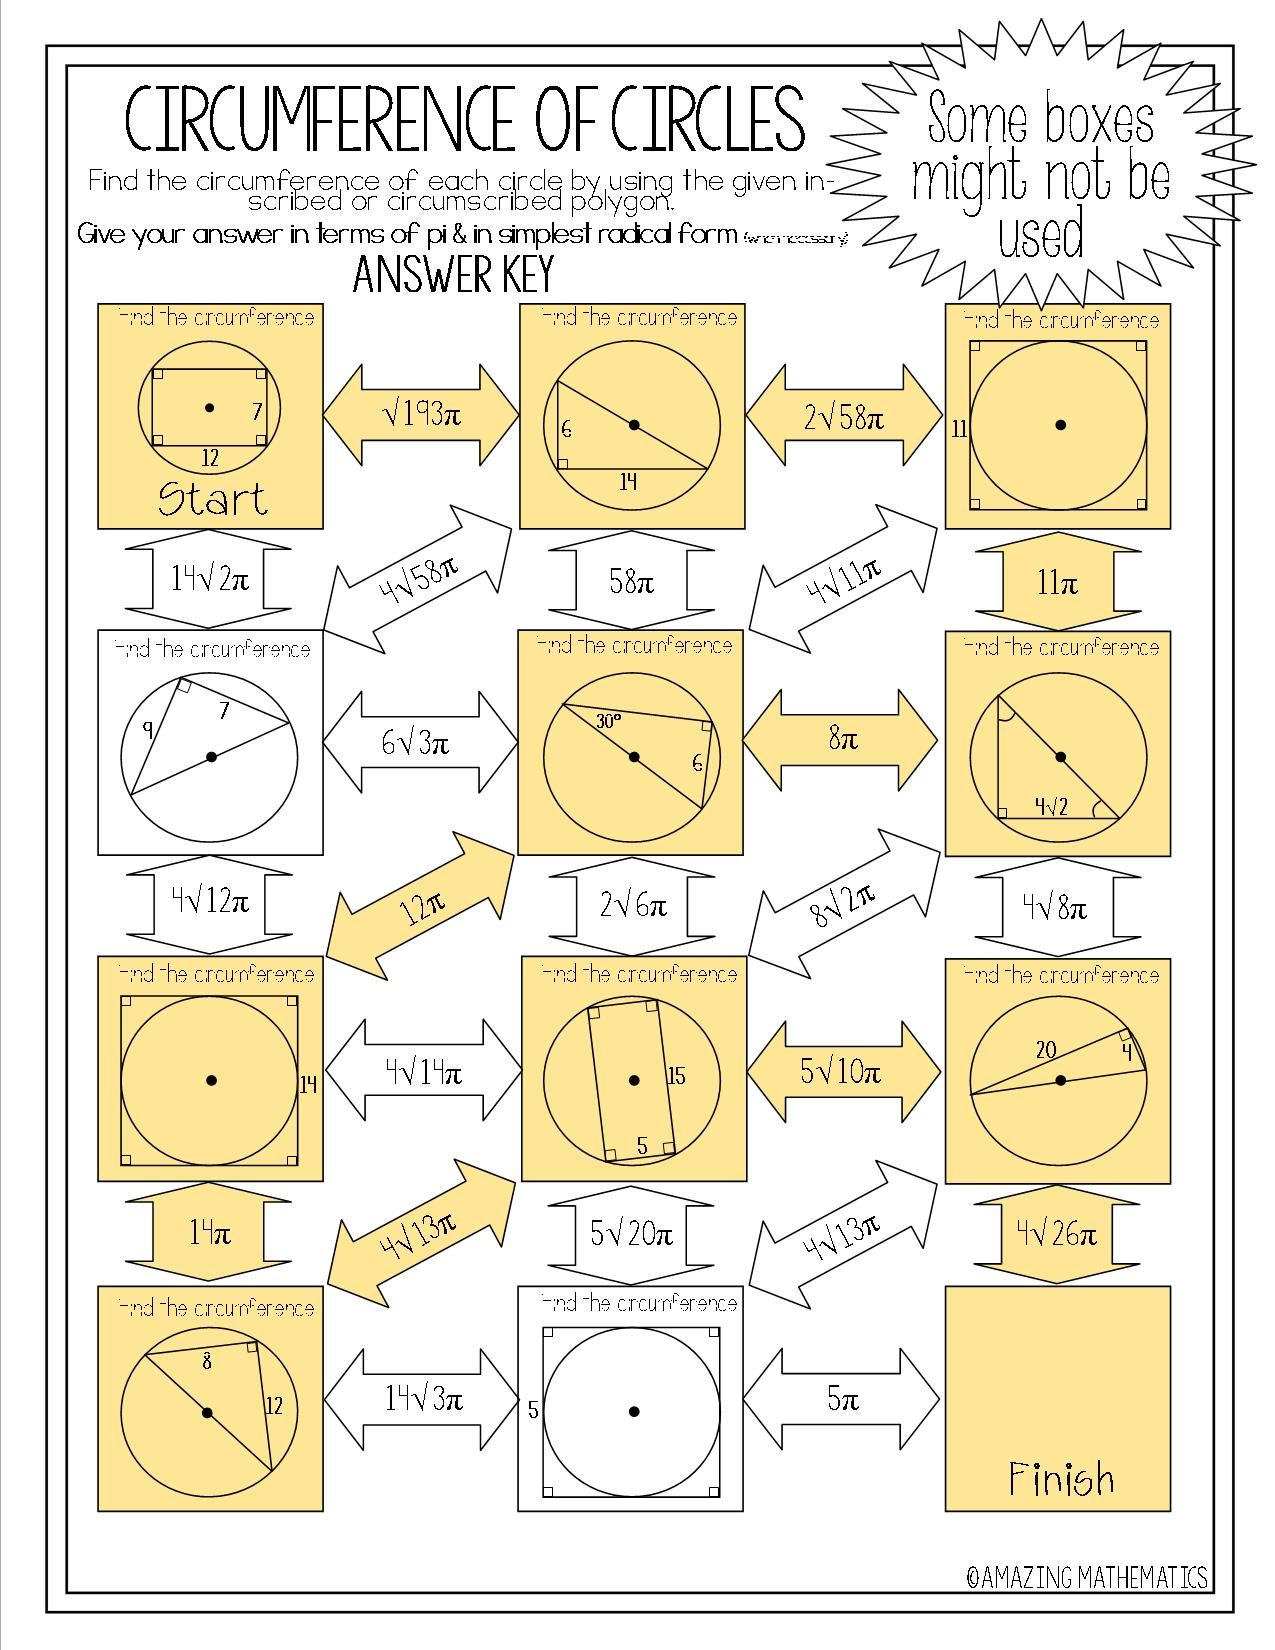 Worksheets Circumference Worksheets circumference of circles maze using inscribed circumscribed polygons